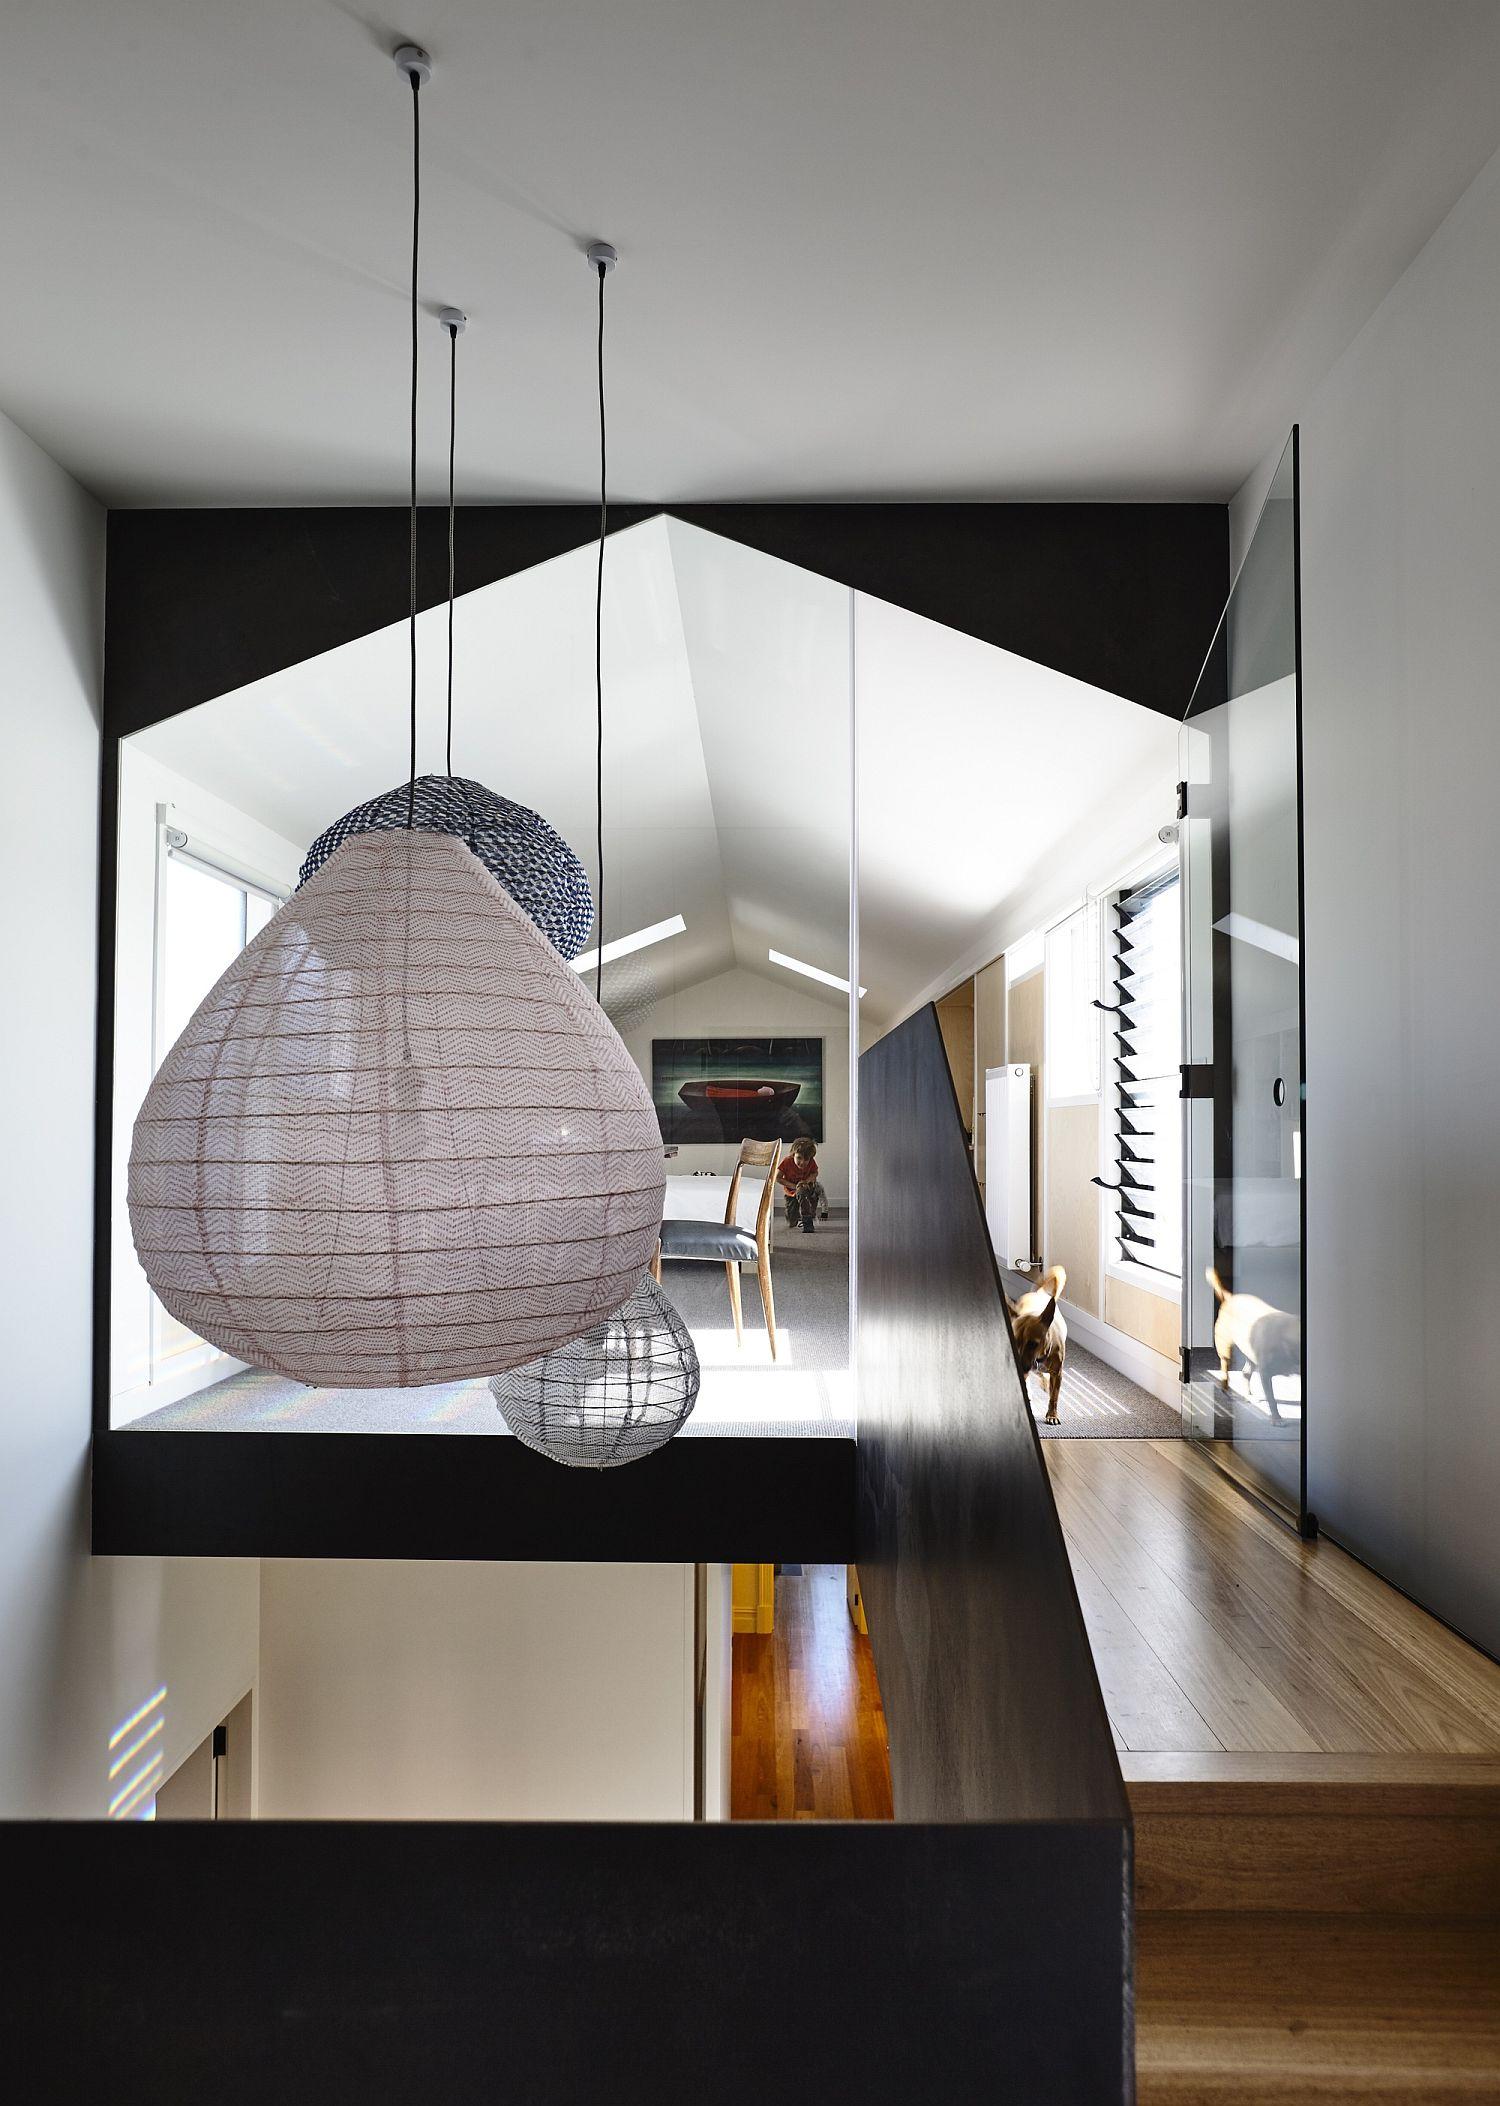 Striking lantern style penfdant lighting for the stairway